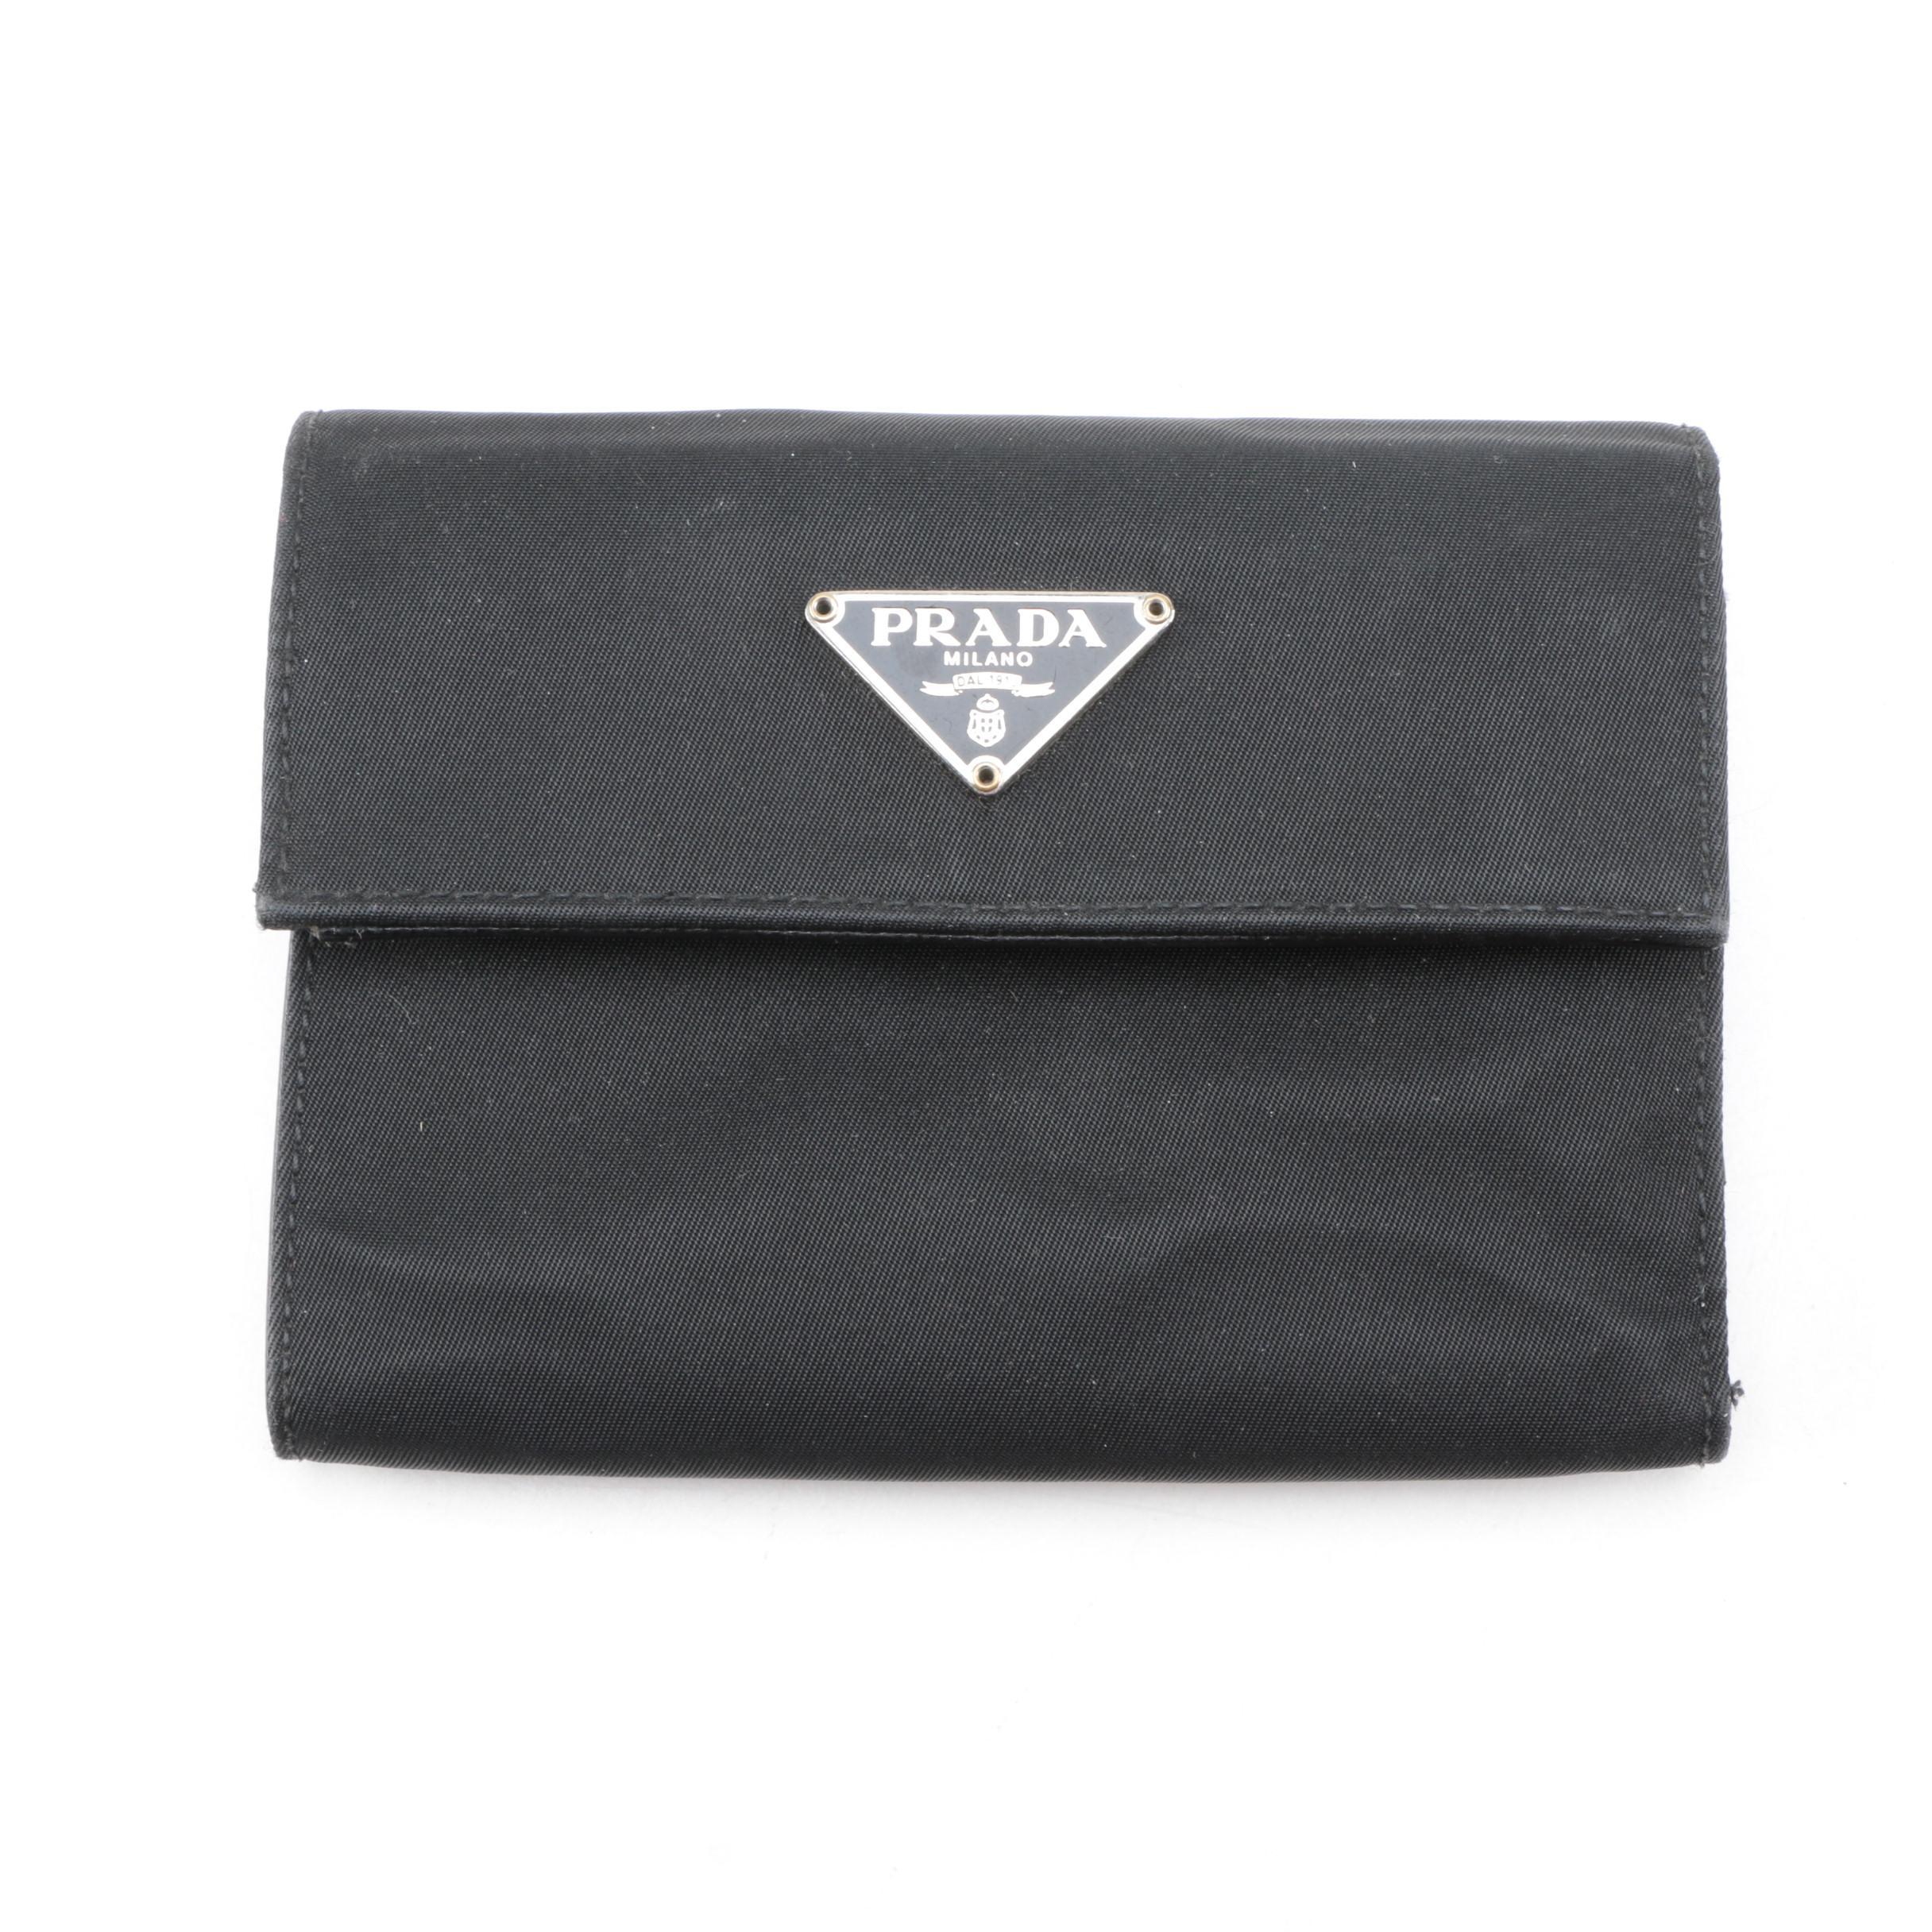 2085f1ea2619 uk prada nylon belt bag de96c 21ee9; low price prada black nylon wallet  9b996 514c9